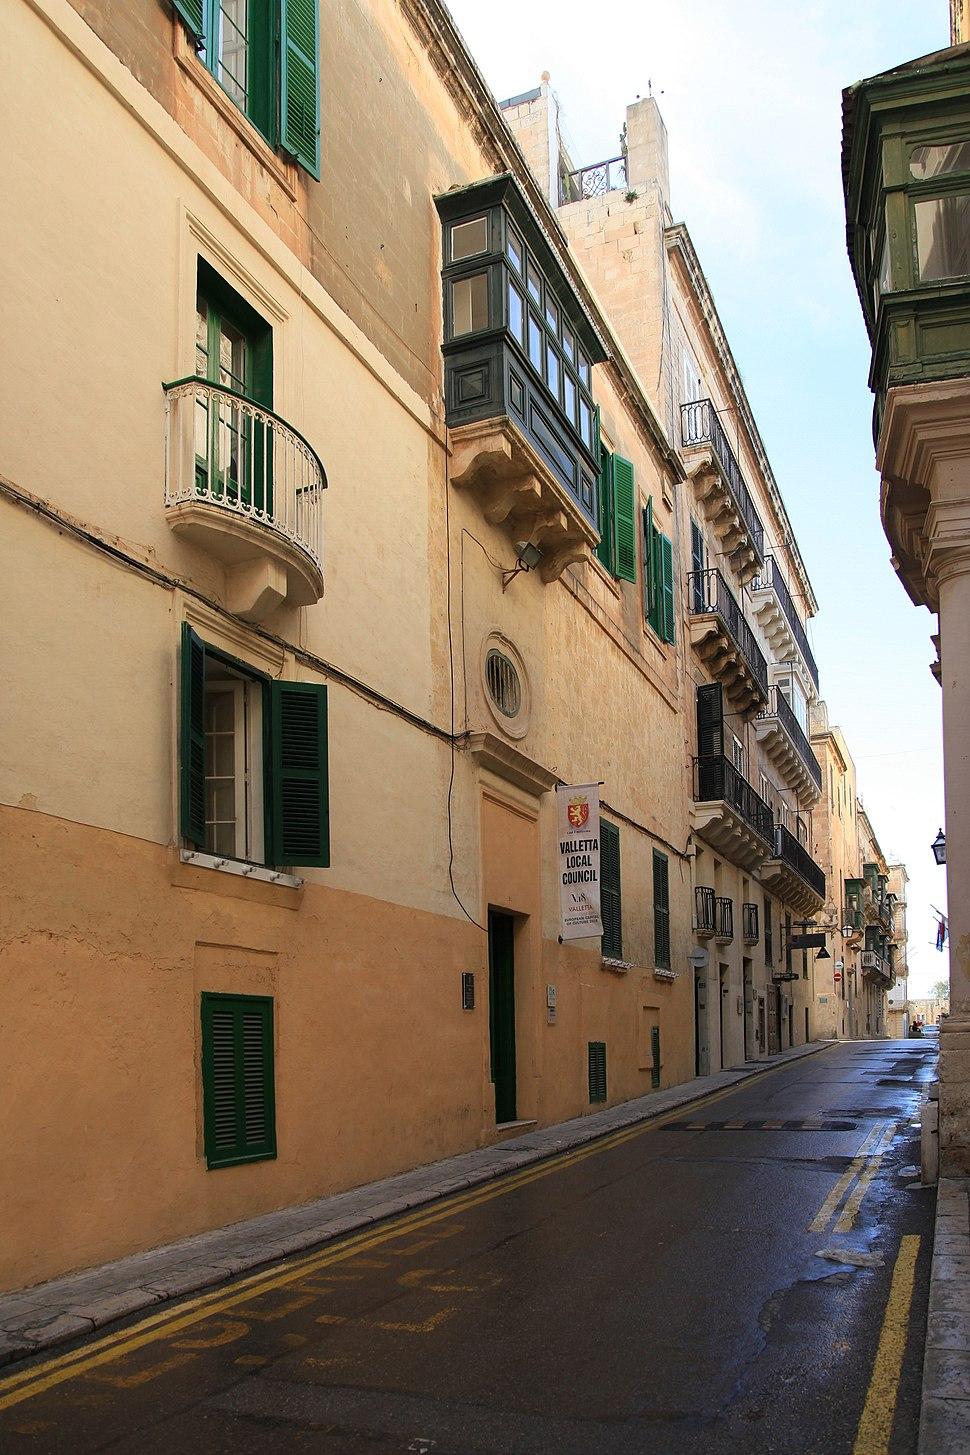 Malta - Valletta - Triq Nofs-in-Nhar + Local Council 01 ies